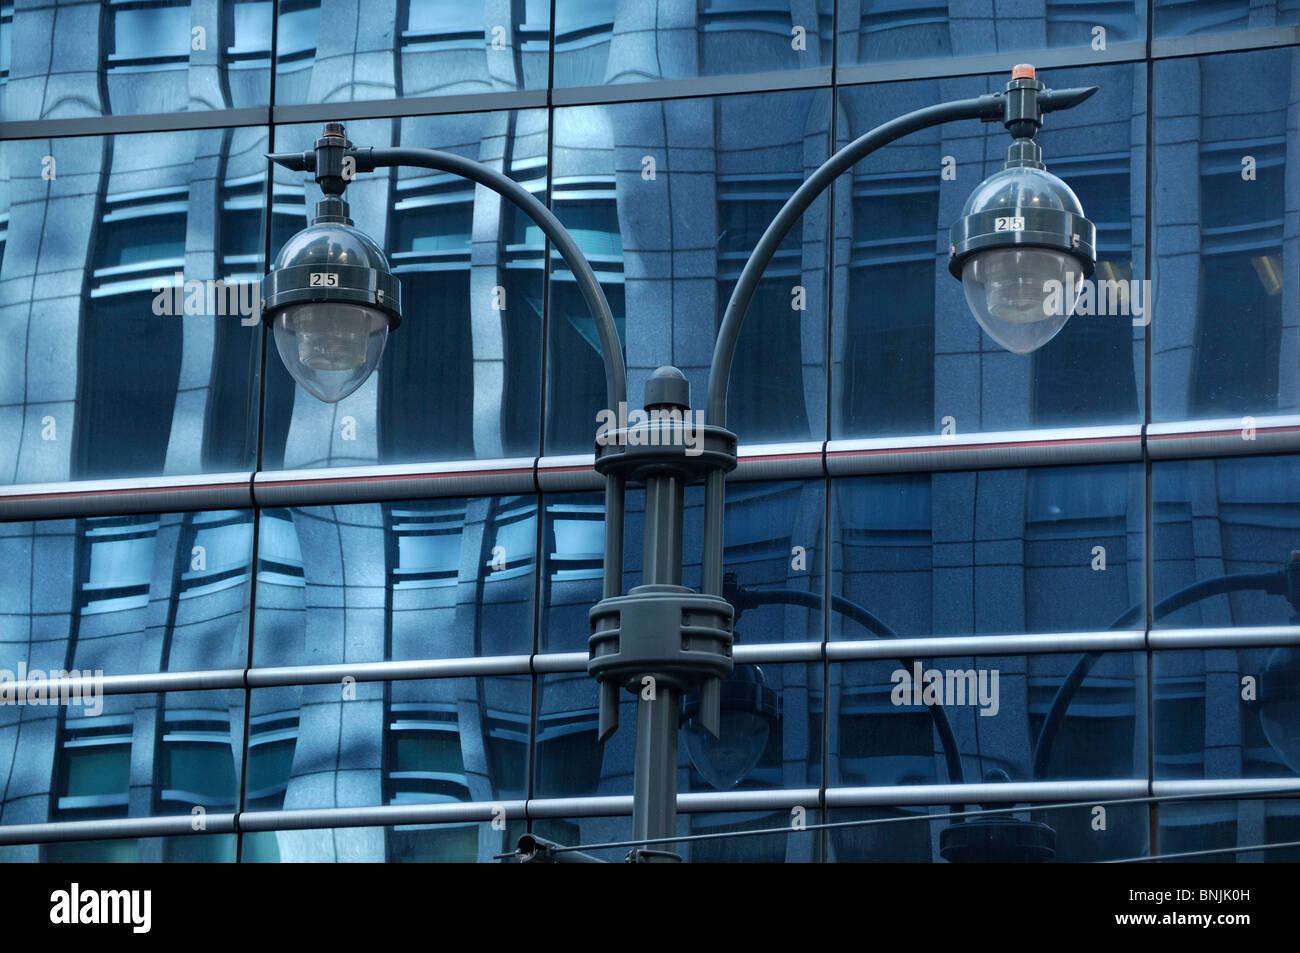 Building 380 Madison Avenue Midtown Manhattan New York USA architecture glass architecture lamps lantern city travel - Stock Image